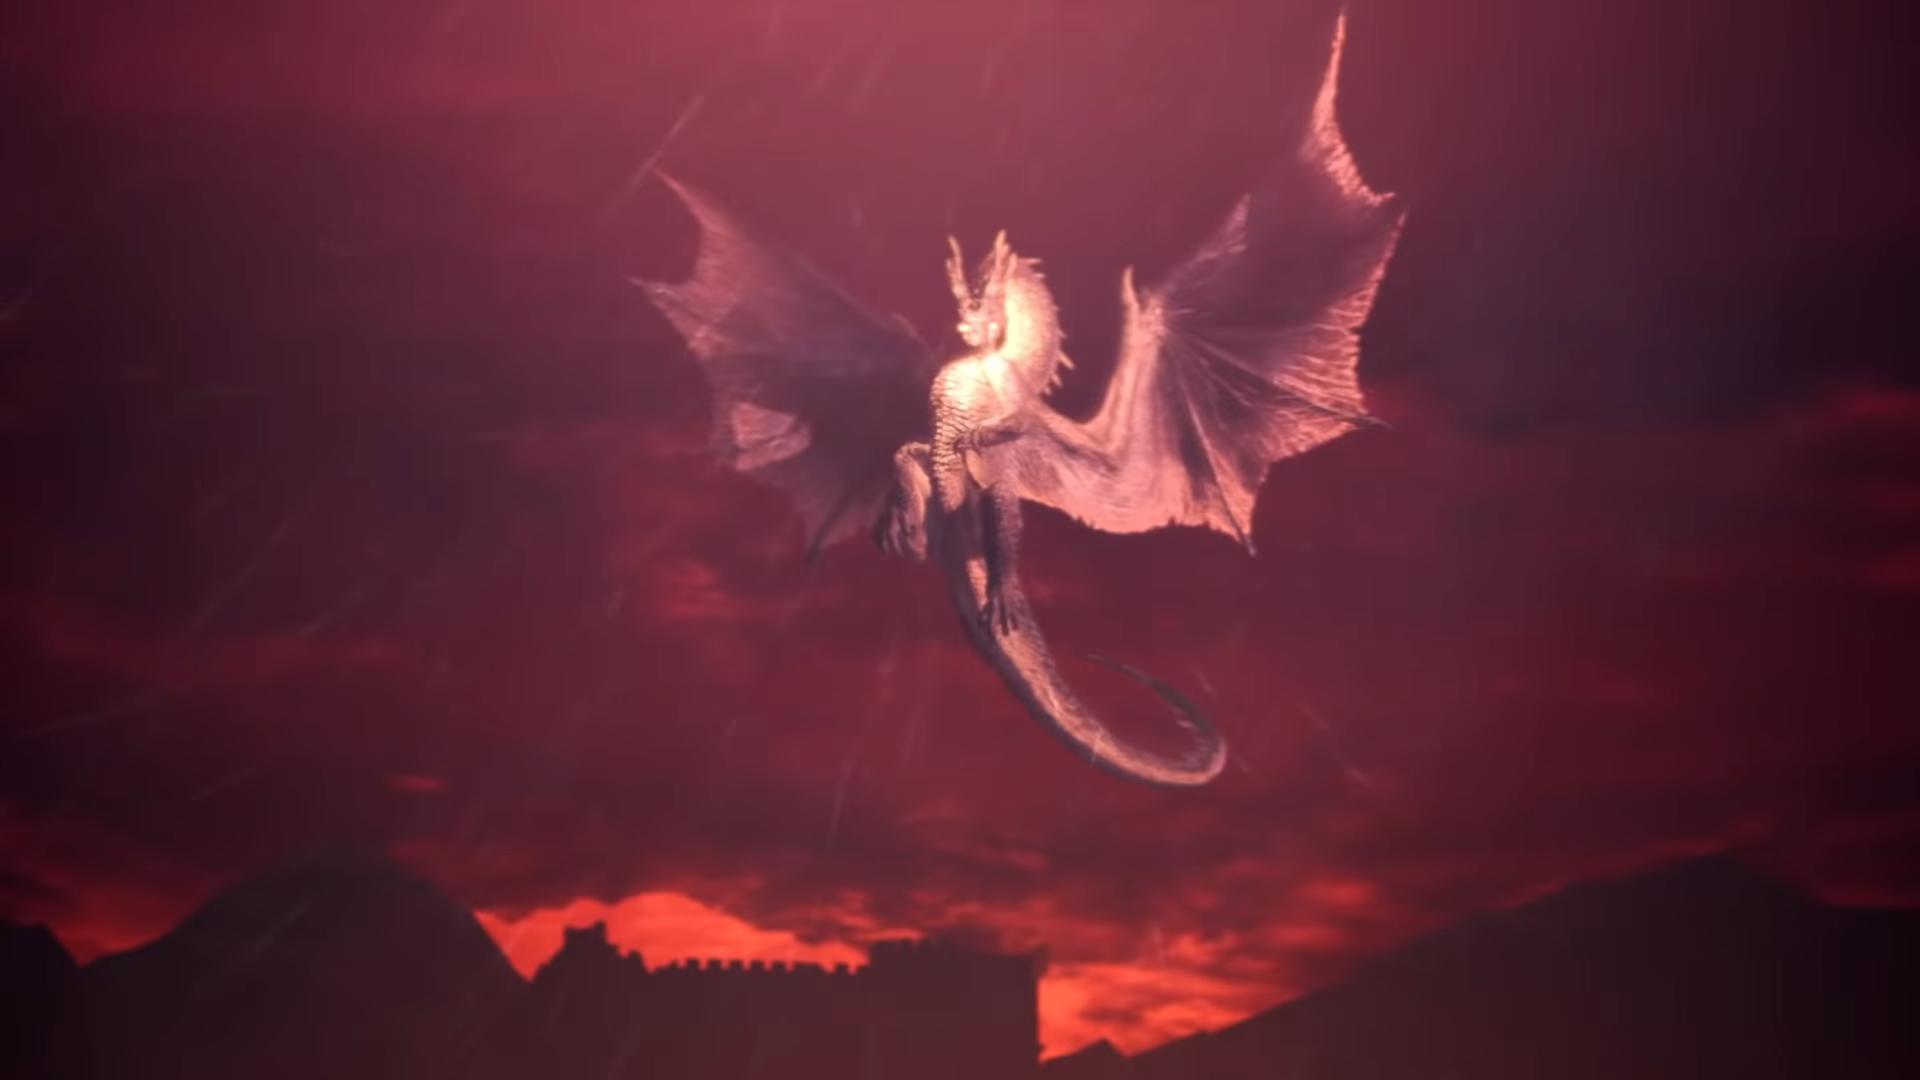 Monster Hunter World_ Iceborne - 개발자 다이어리_ The Final Stand 0-59 screenshot.png